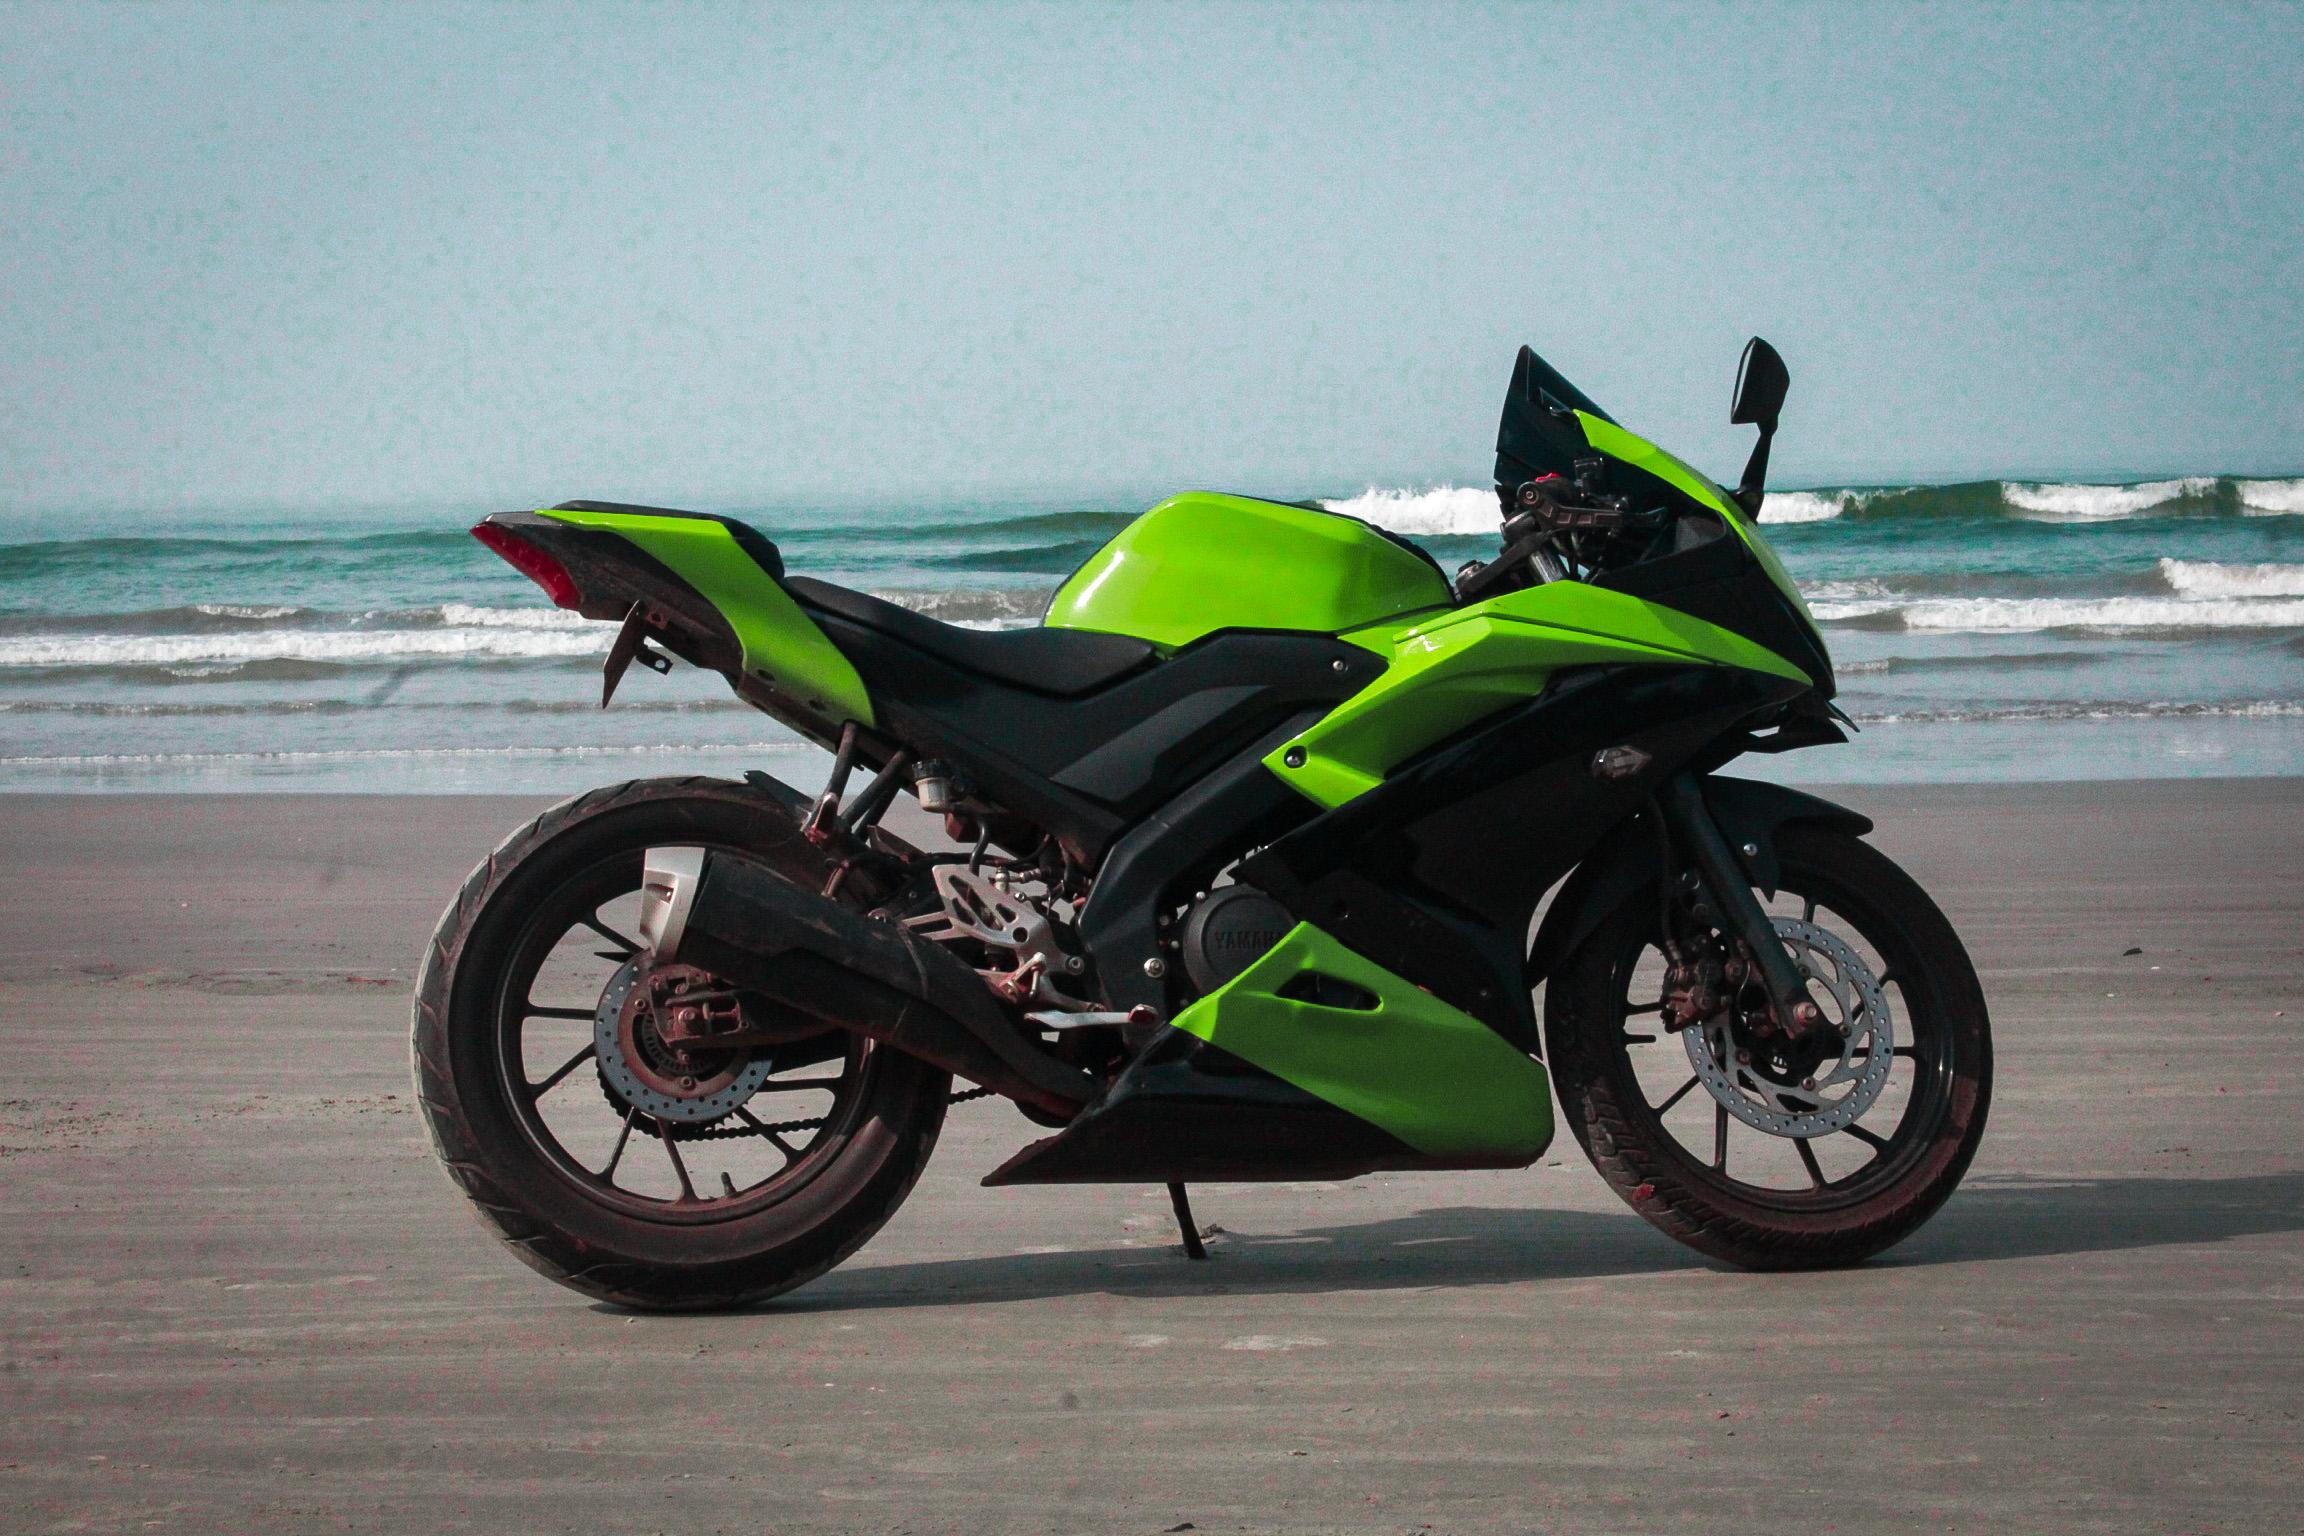 motorbike on the beach side